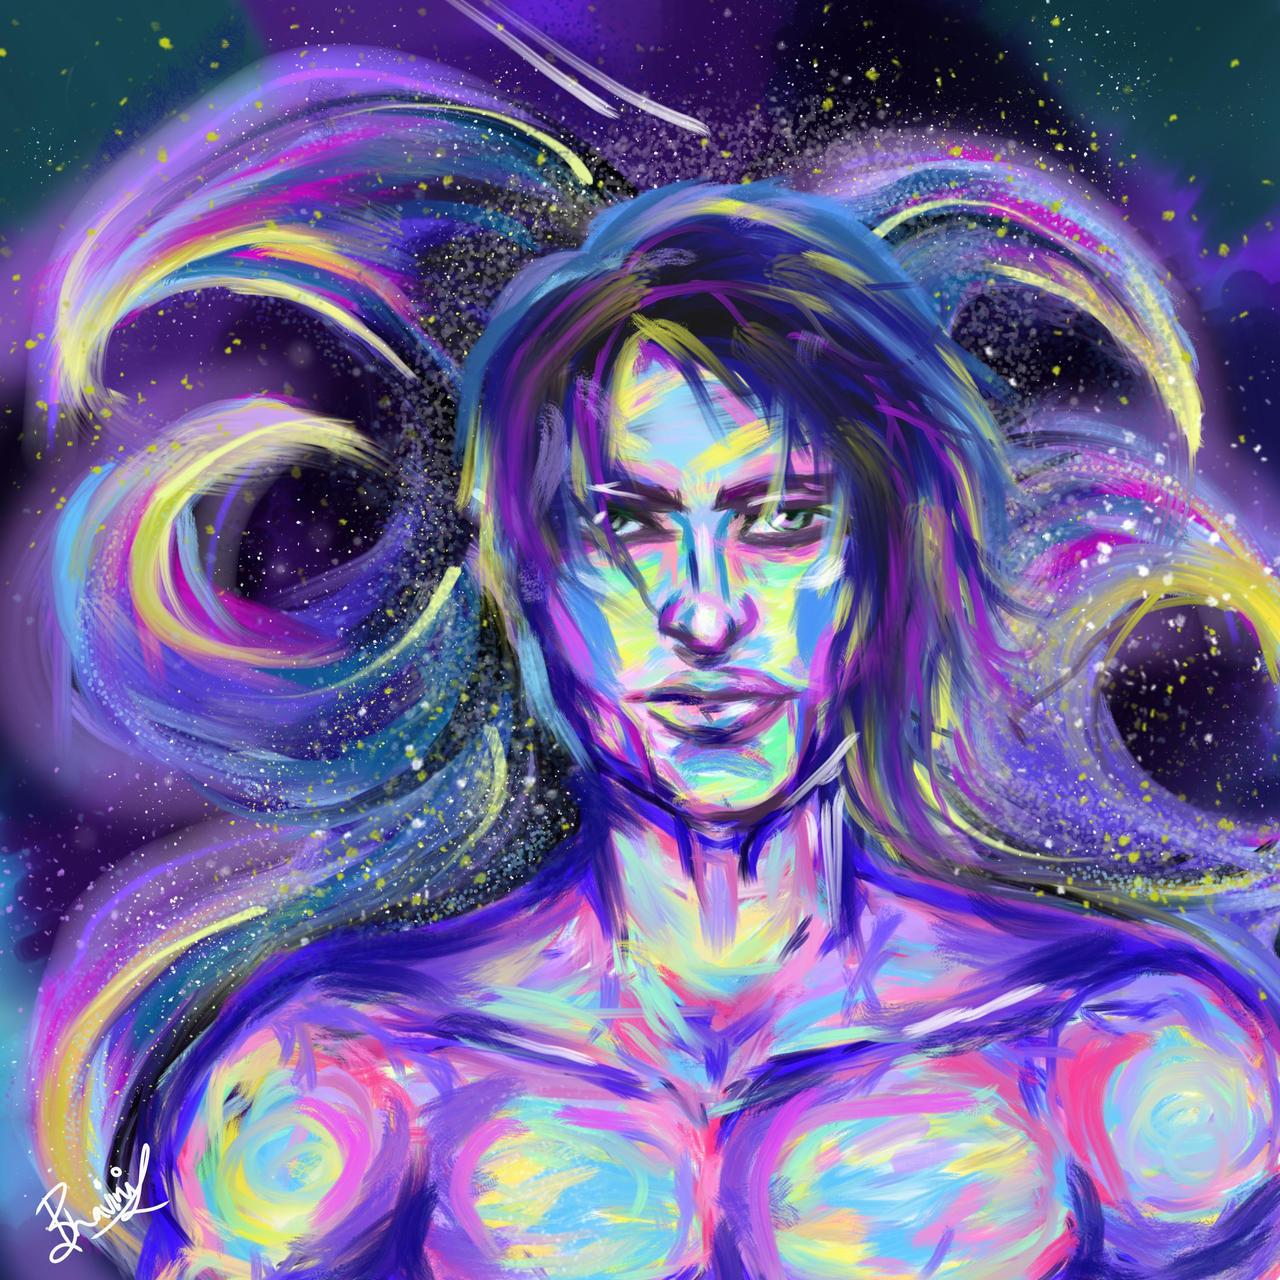 Fantasy Electric Man